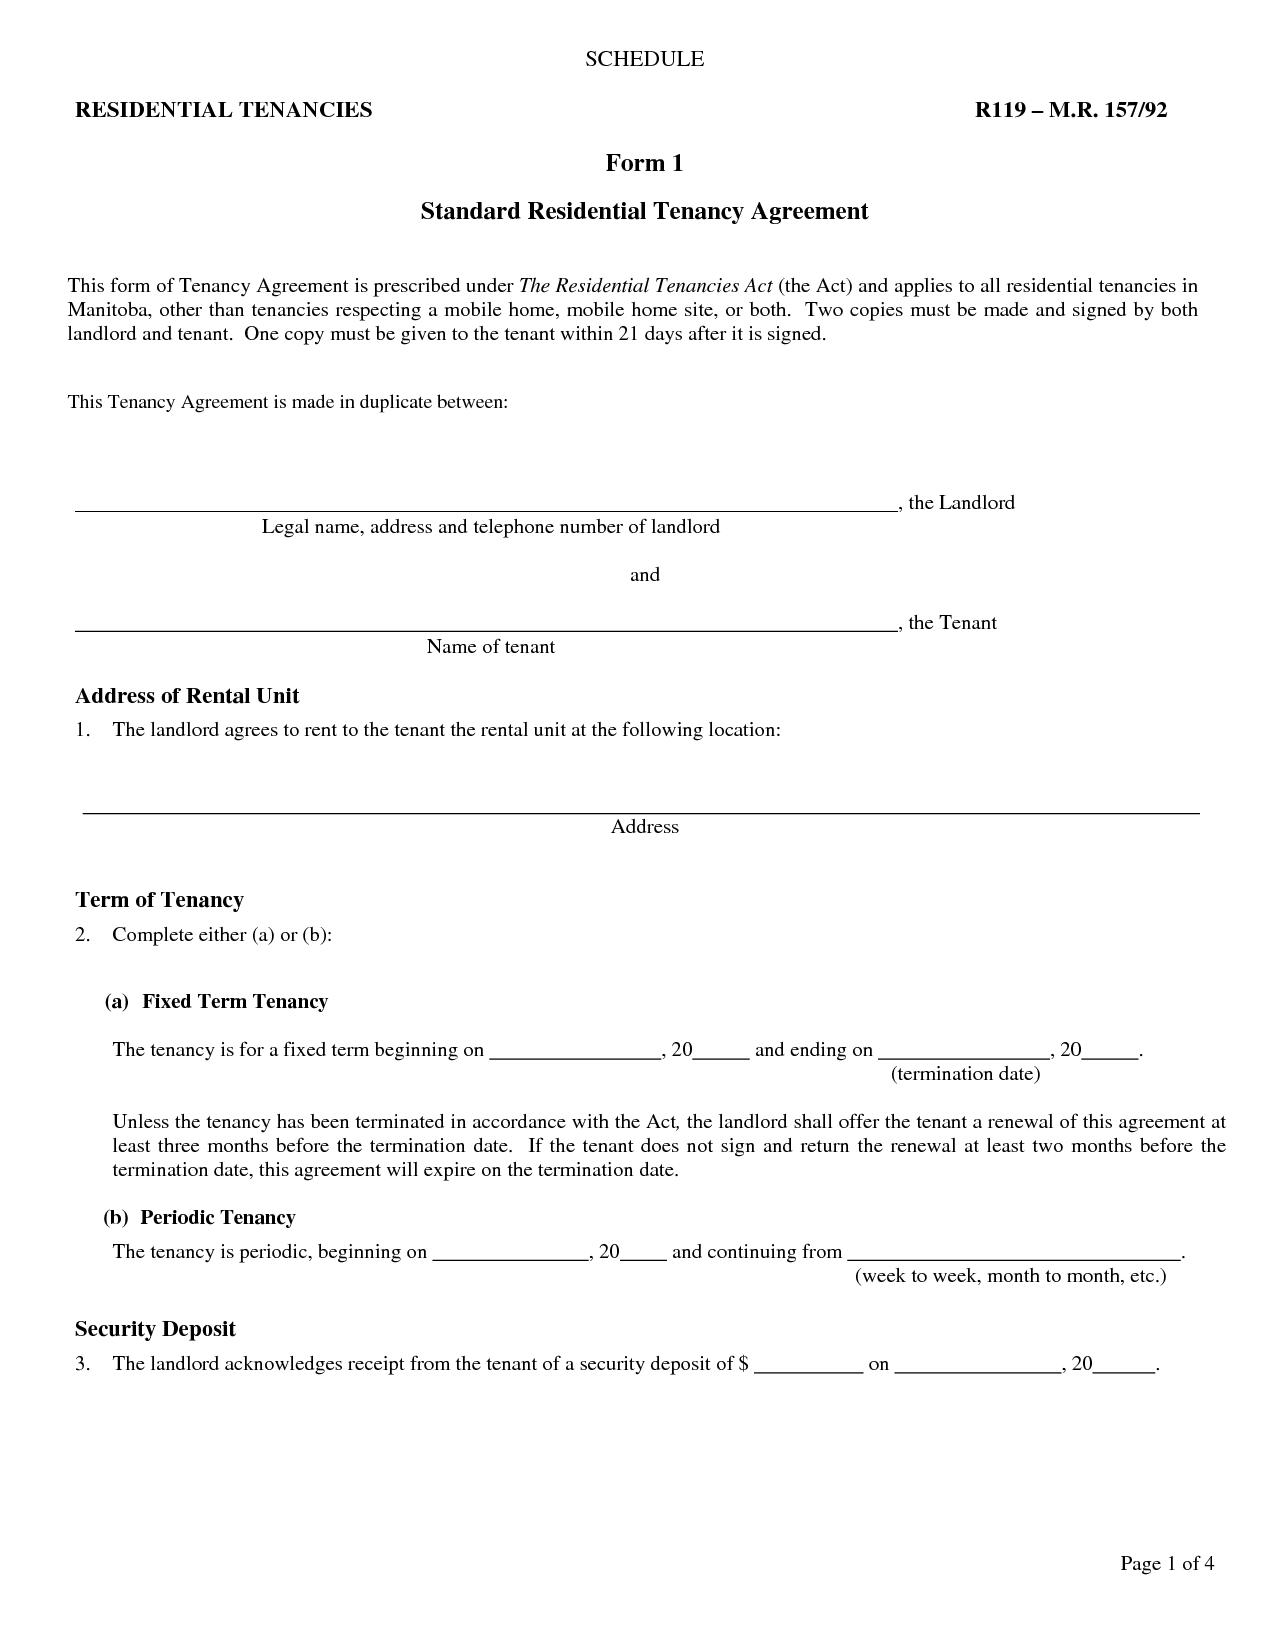 Free Copy Rental Lease Agreement Landlord Rental Agreement Form Https 75maingroup Com Rent Ag Rental Agreement Templates Tenancy Agreement Being A Landlord